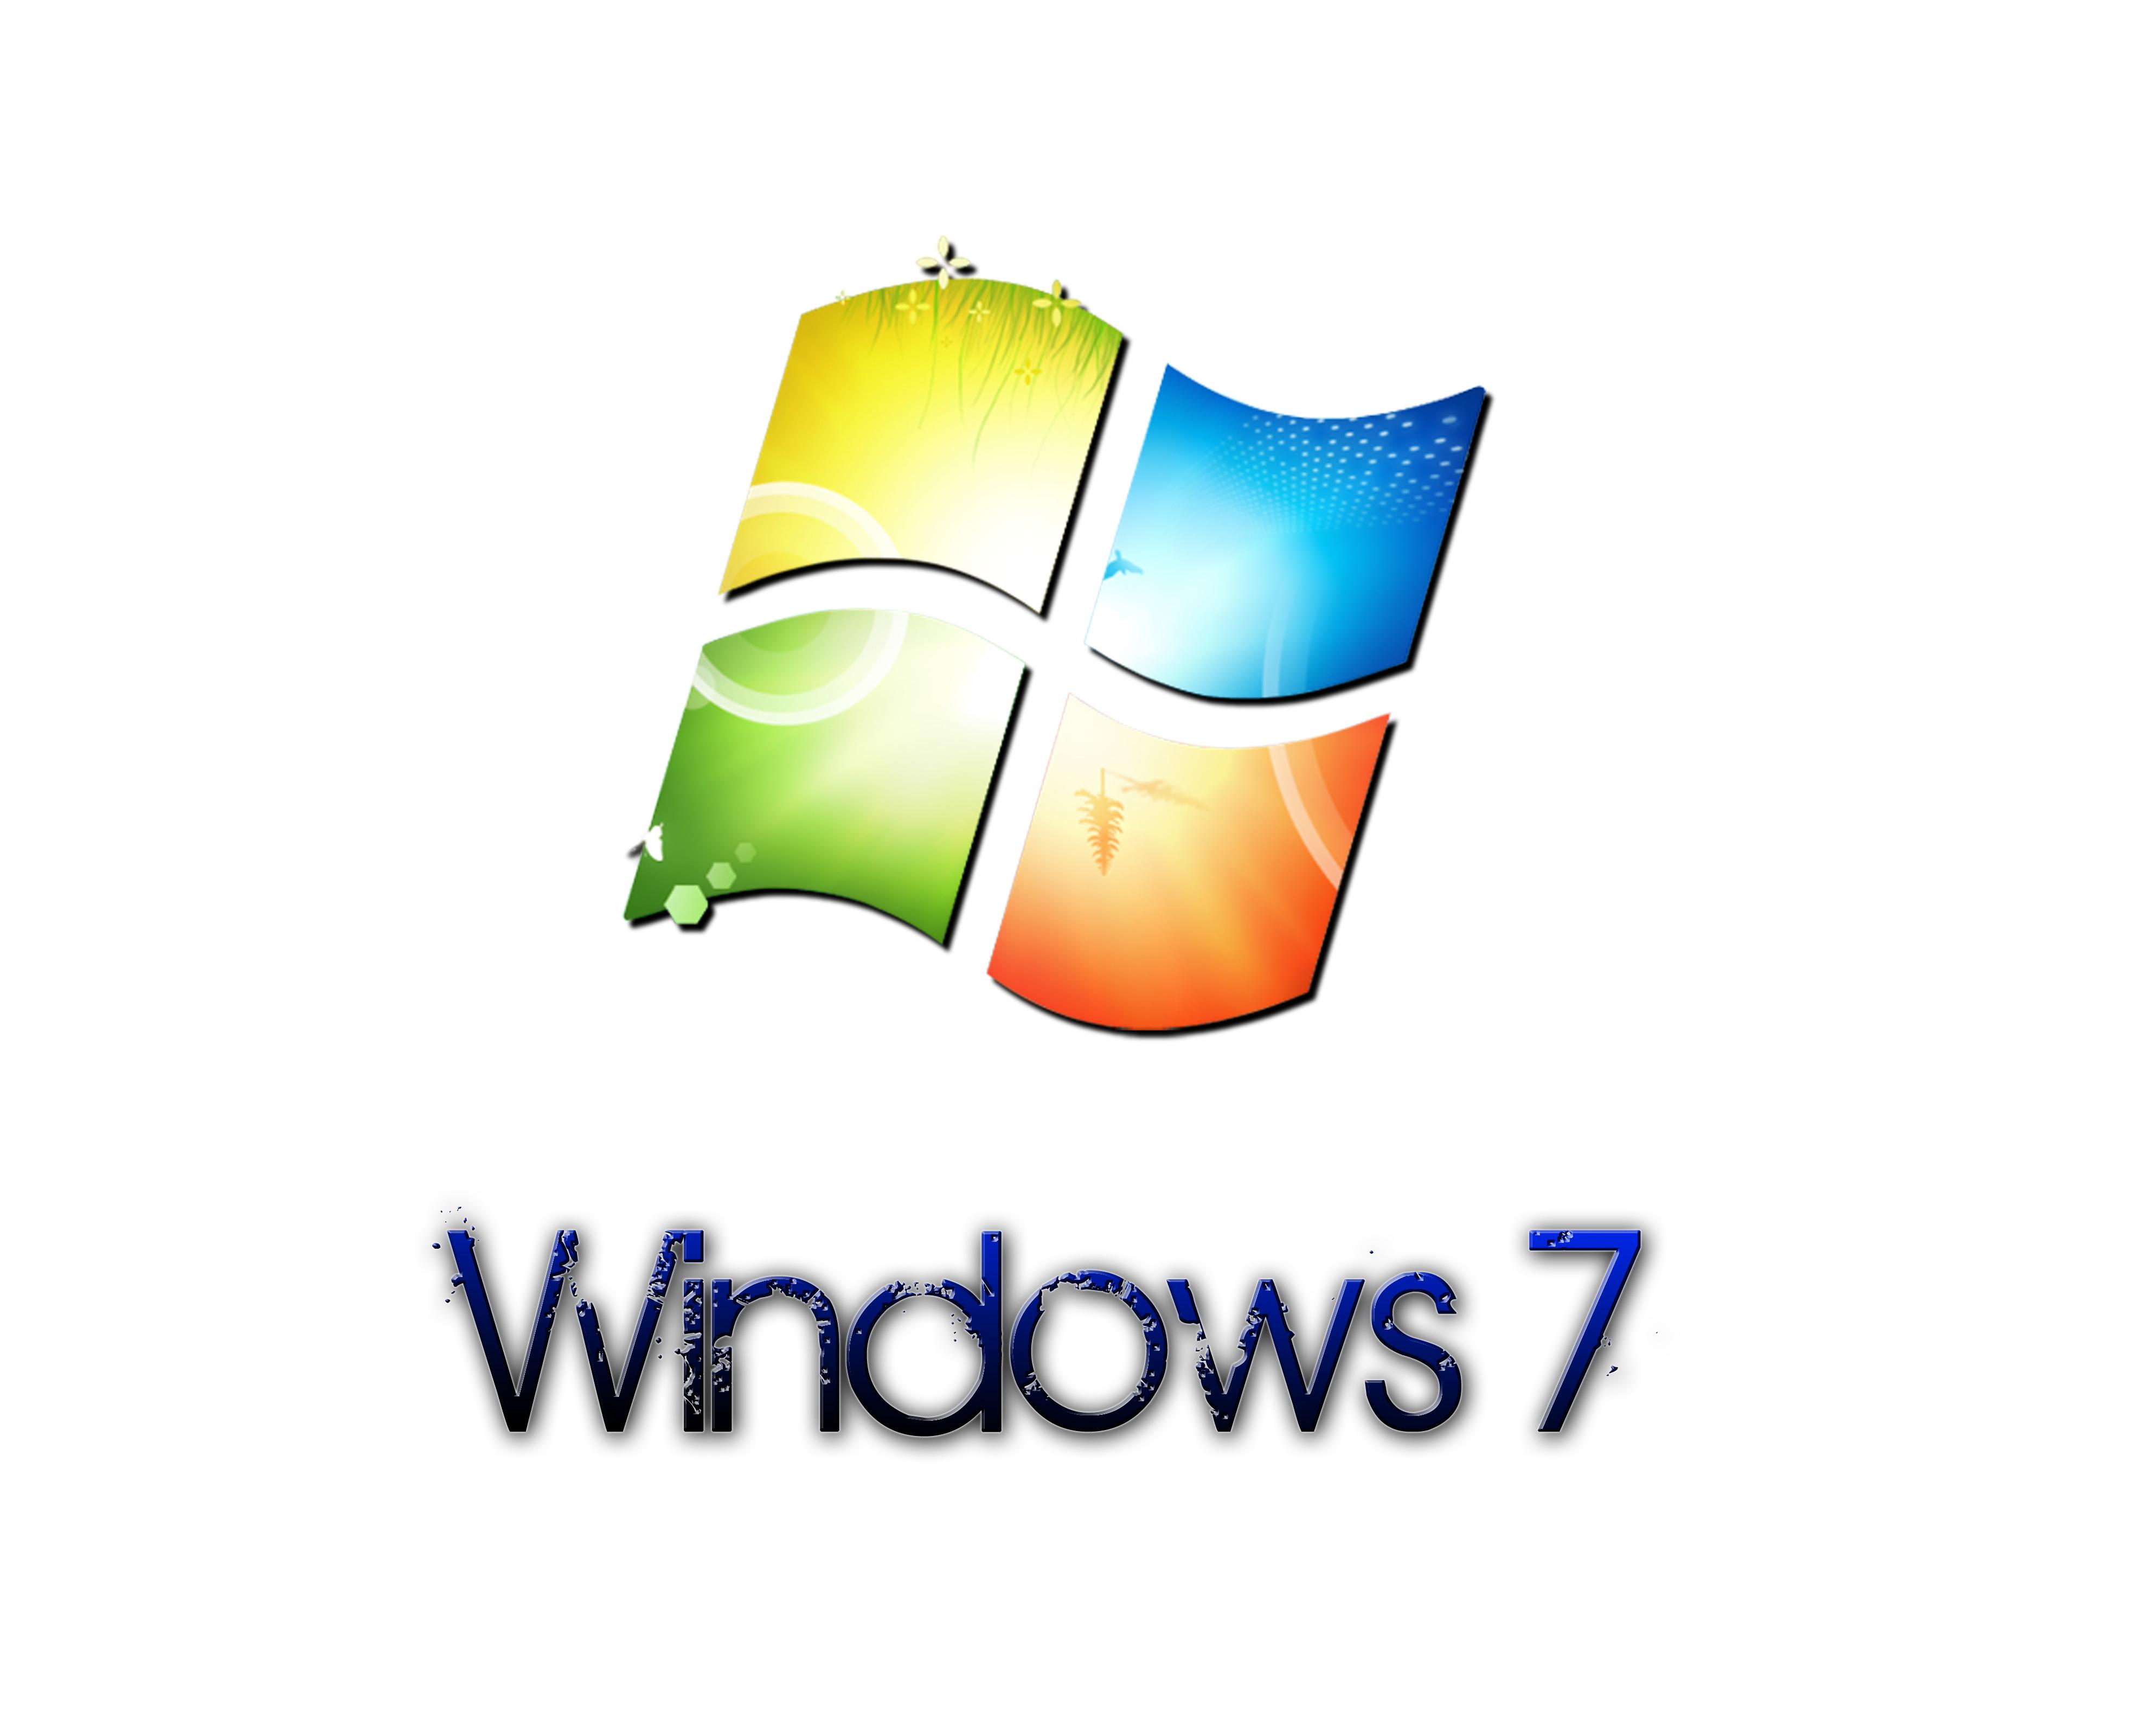 Official Windows 7 Logo Windows 7 by bombastiq-d38hse1 jpgOfficial Windows 7 Logo